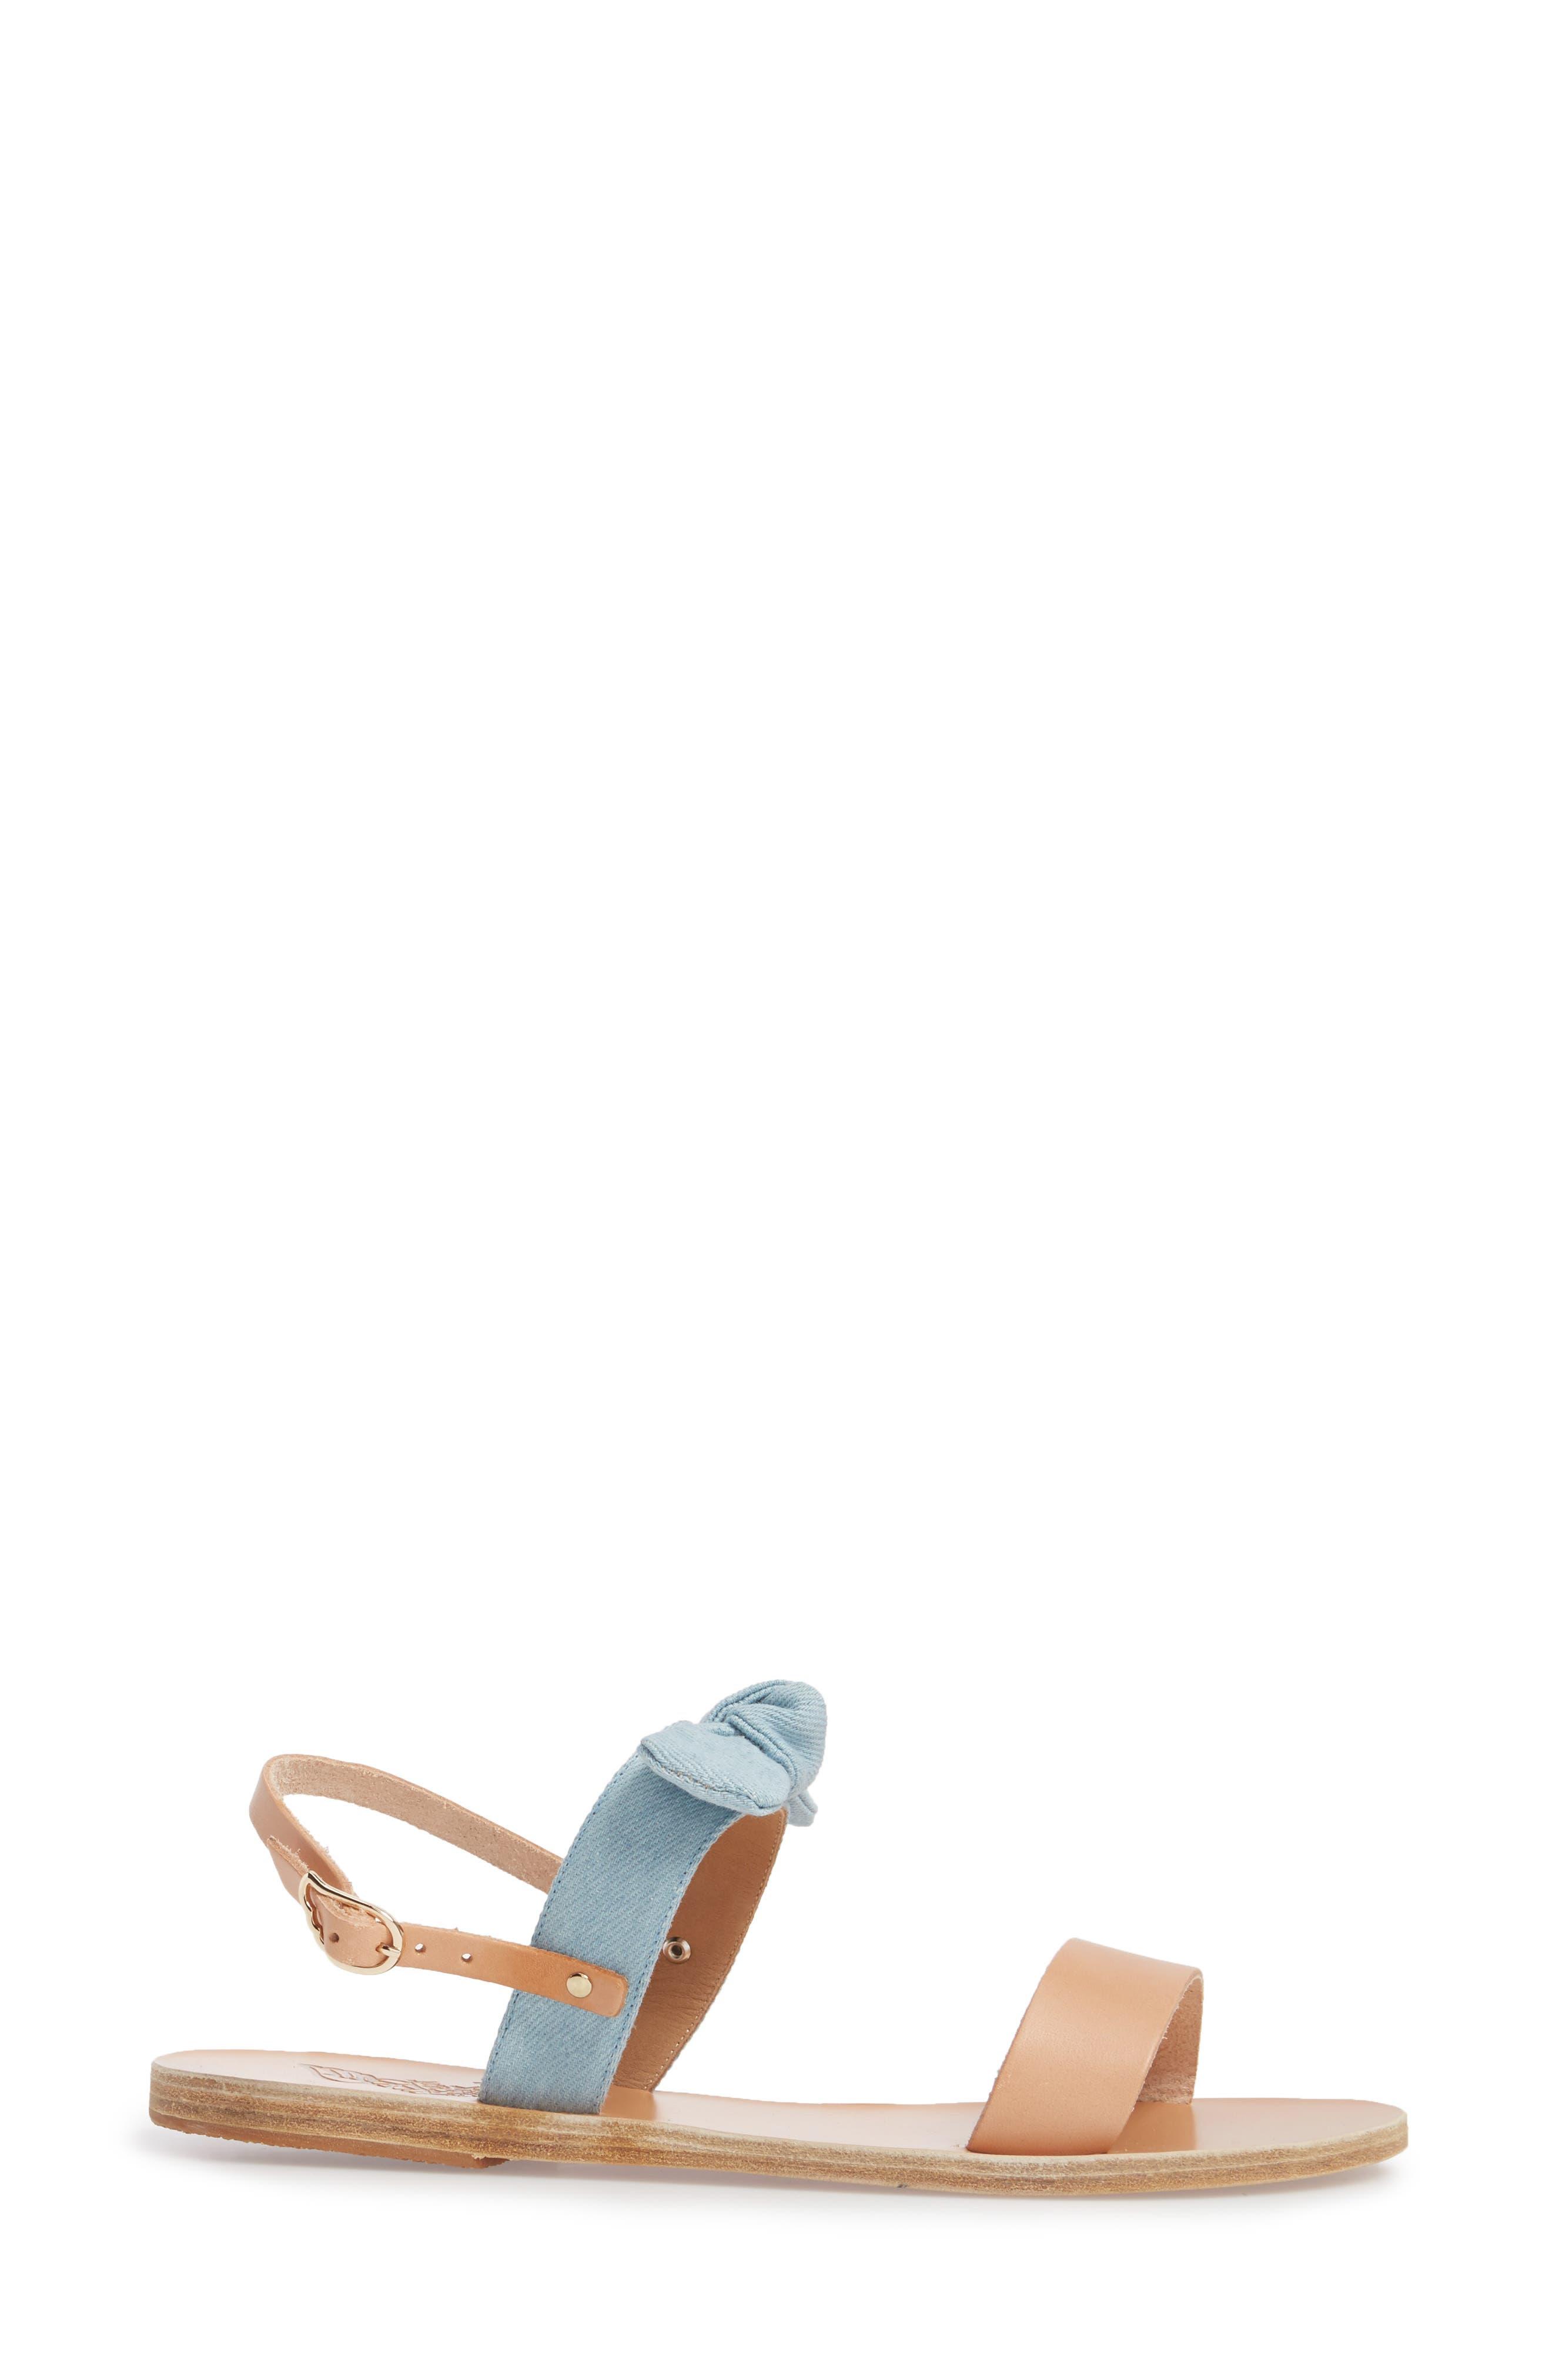 Clio Bow Sandal,                             Alternate thumbnail 3, color,                             400